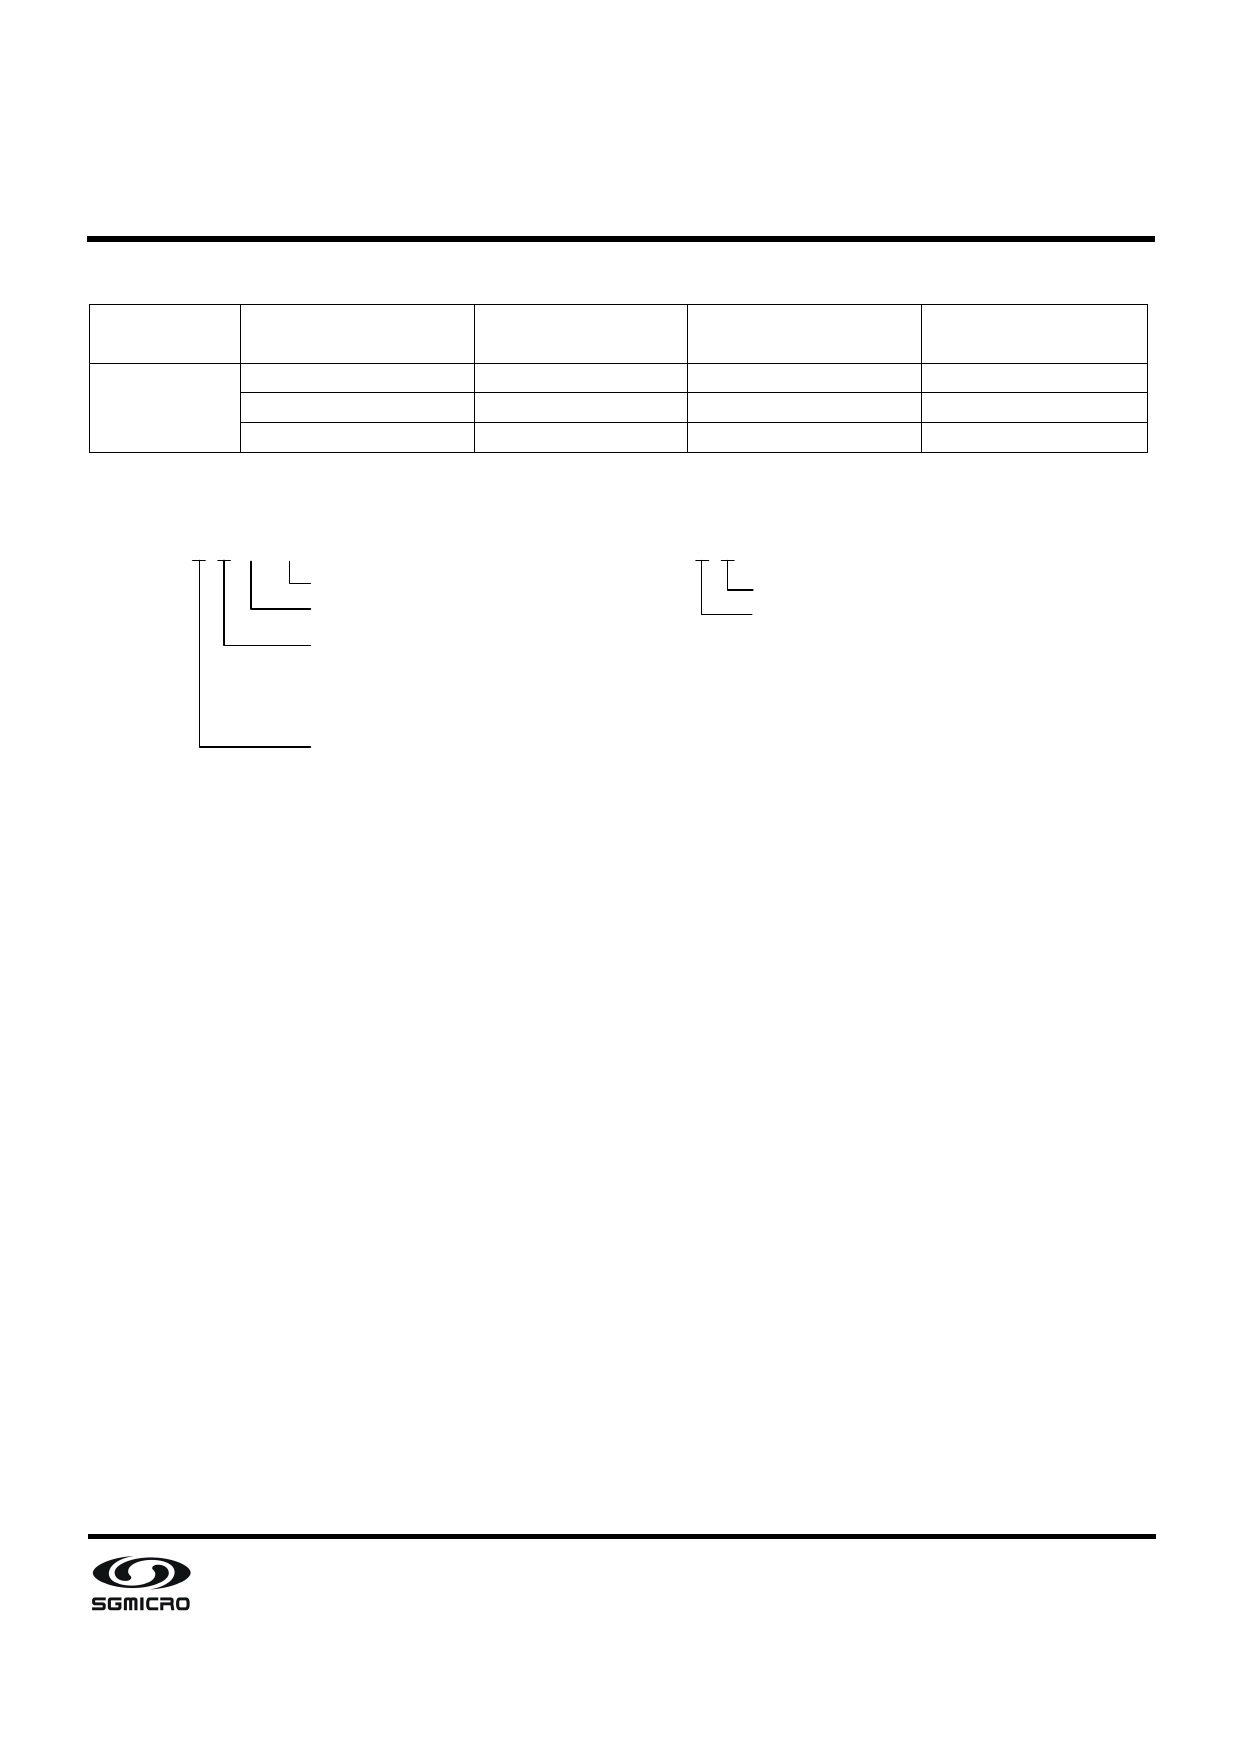 SGM8581 pdf, schematic